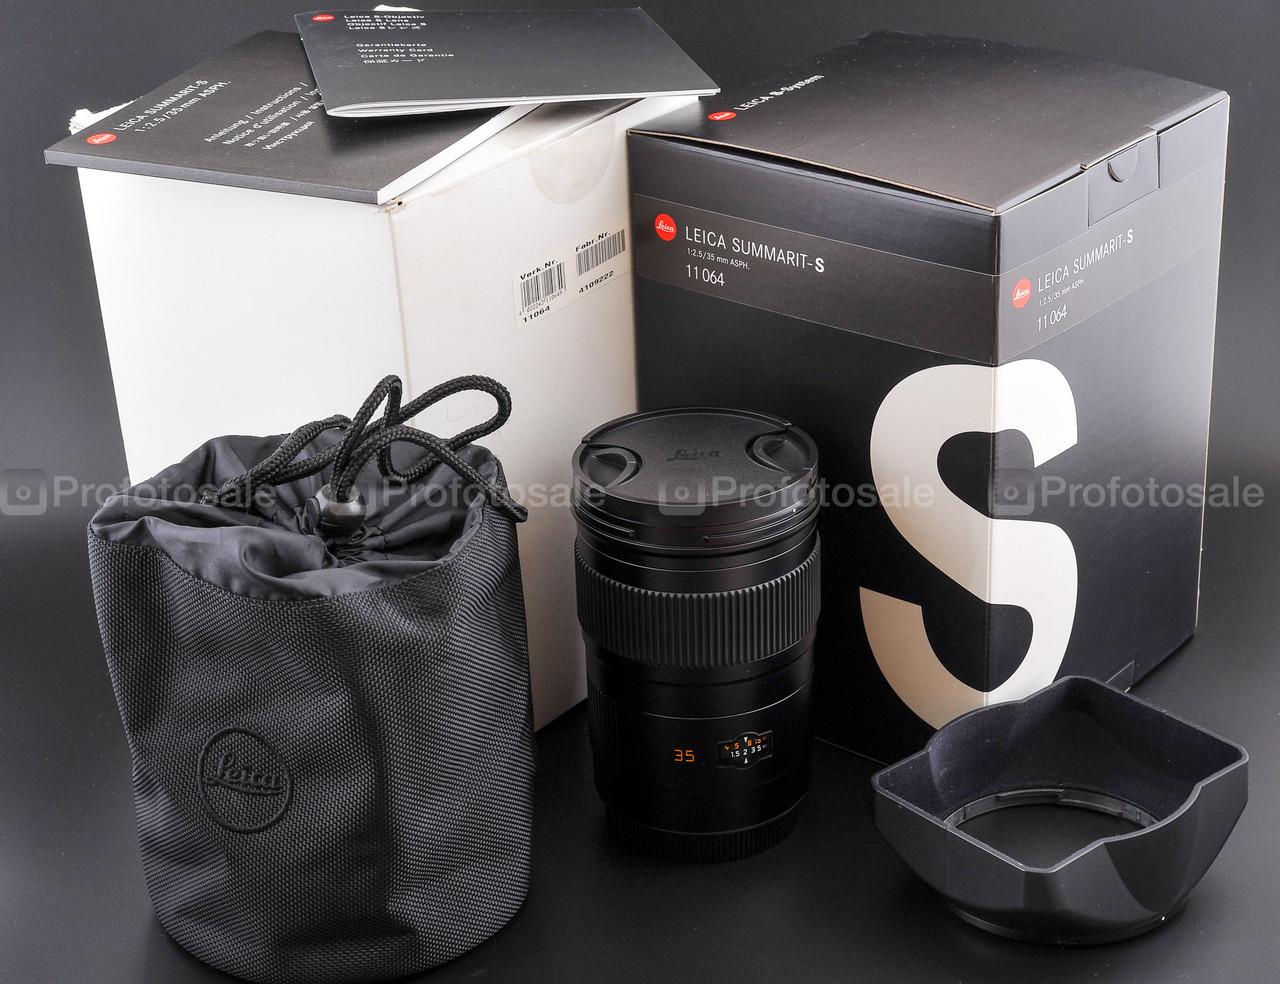 Leica Summarit-S 35mm f2.5 ASPH #11064